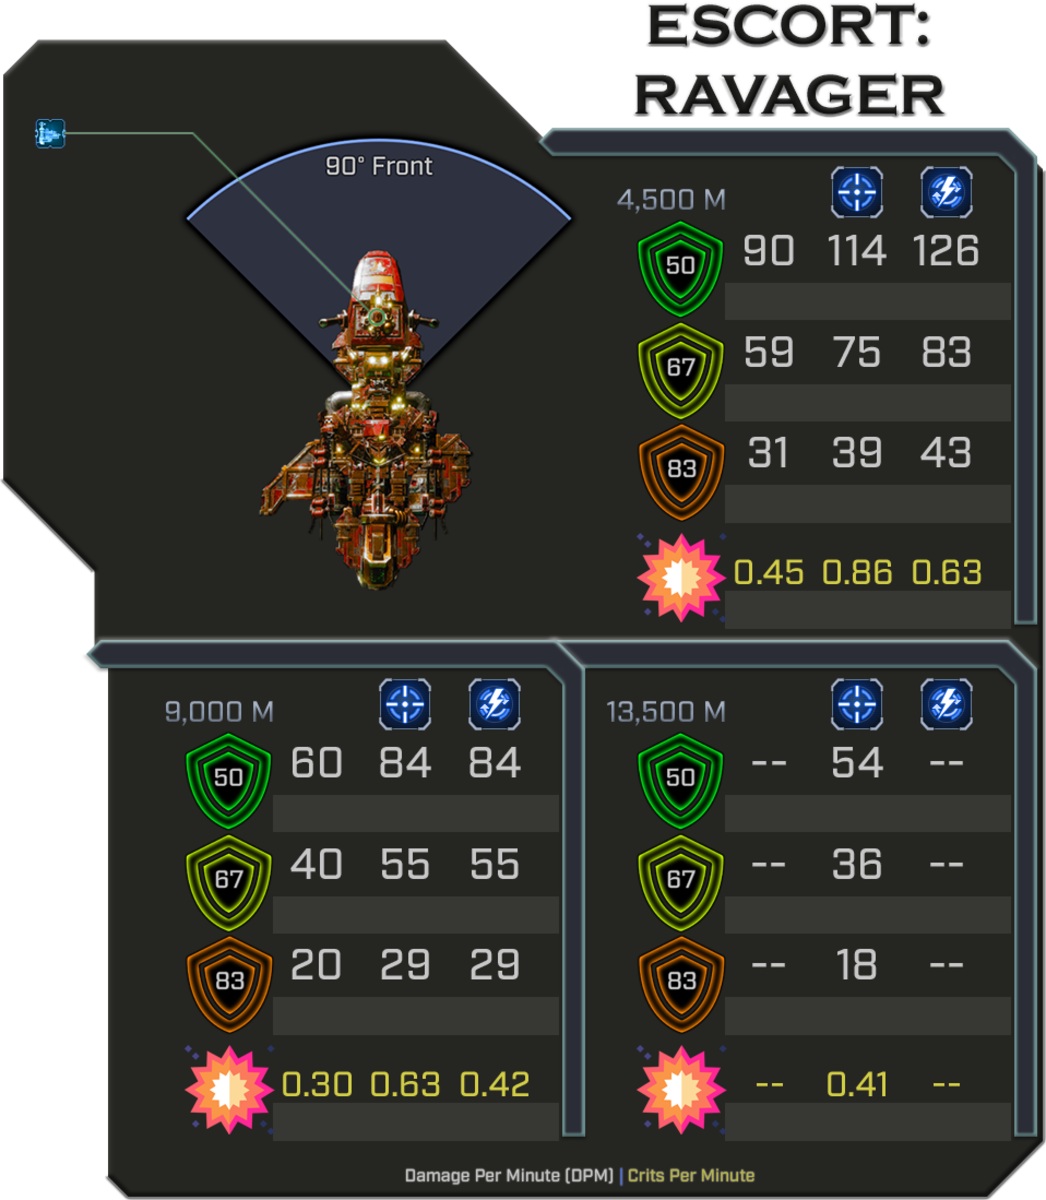 Ravager - Weapon Damage Profile